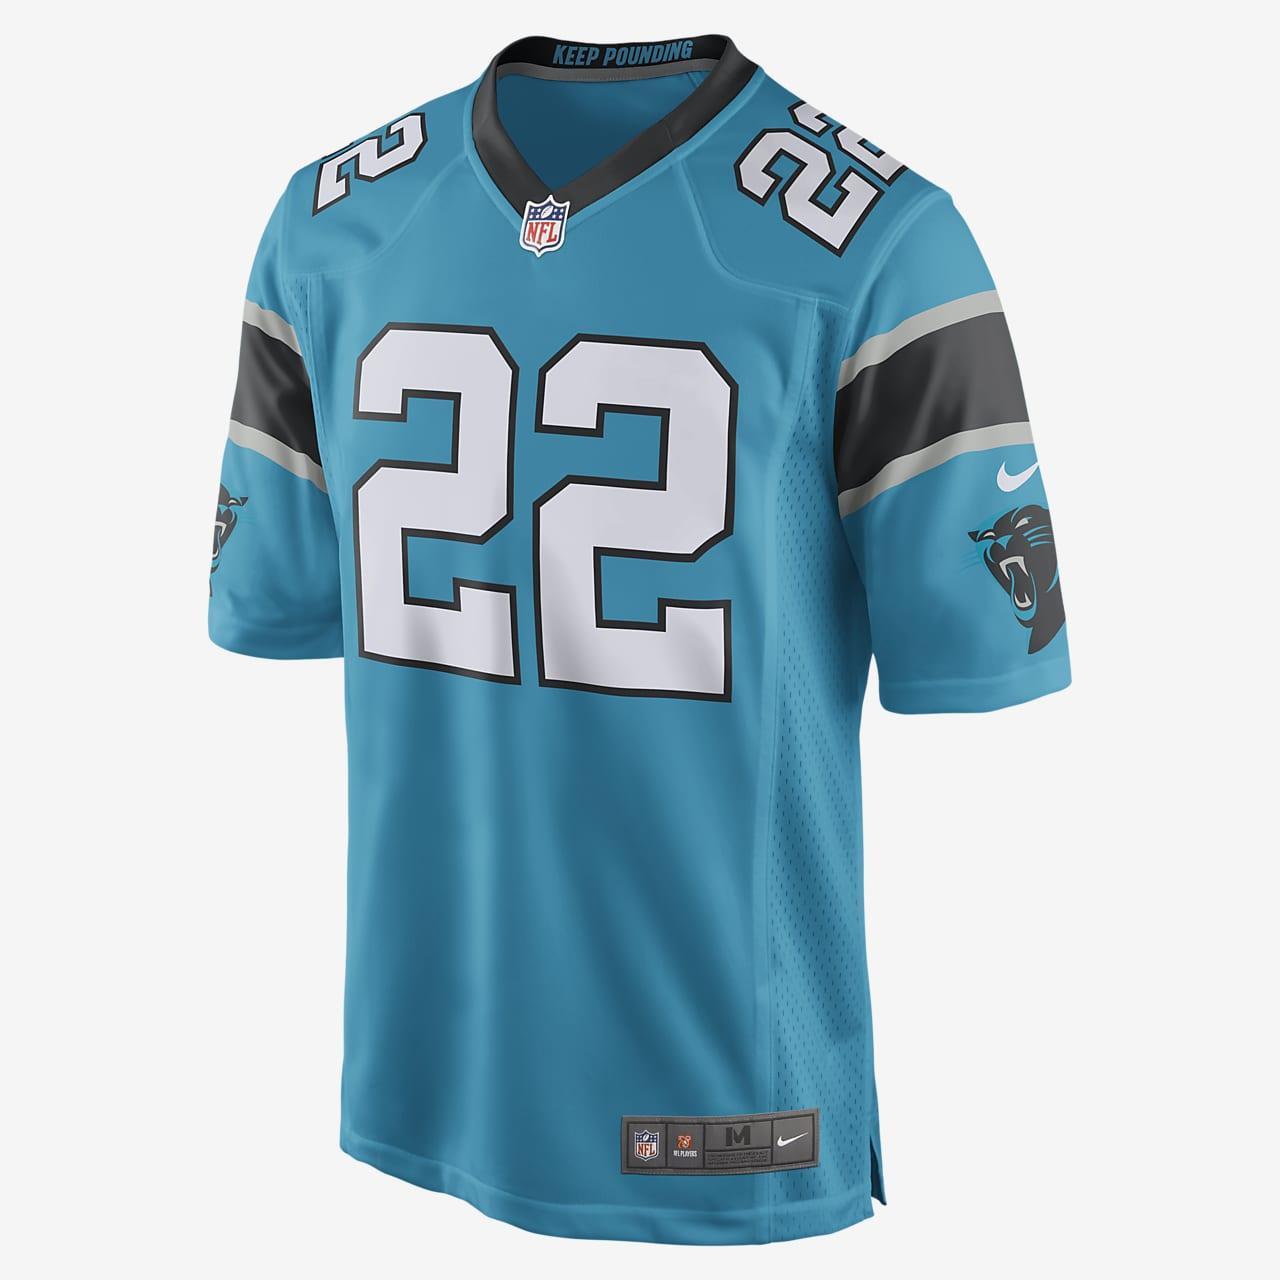 NFL Carolina Panthers Game Jersey (Christian McCaffrey) Men's Football Jersey